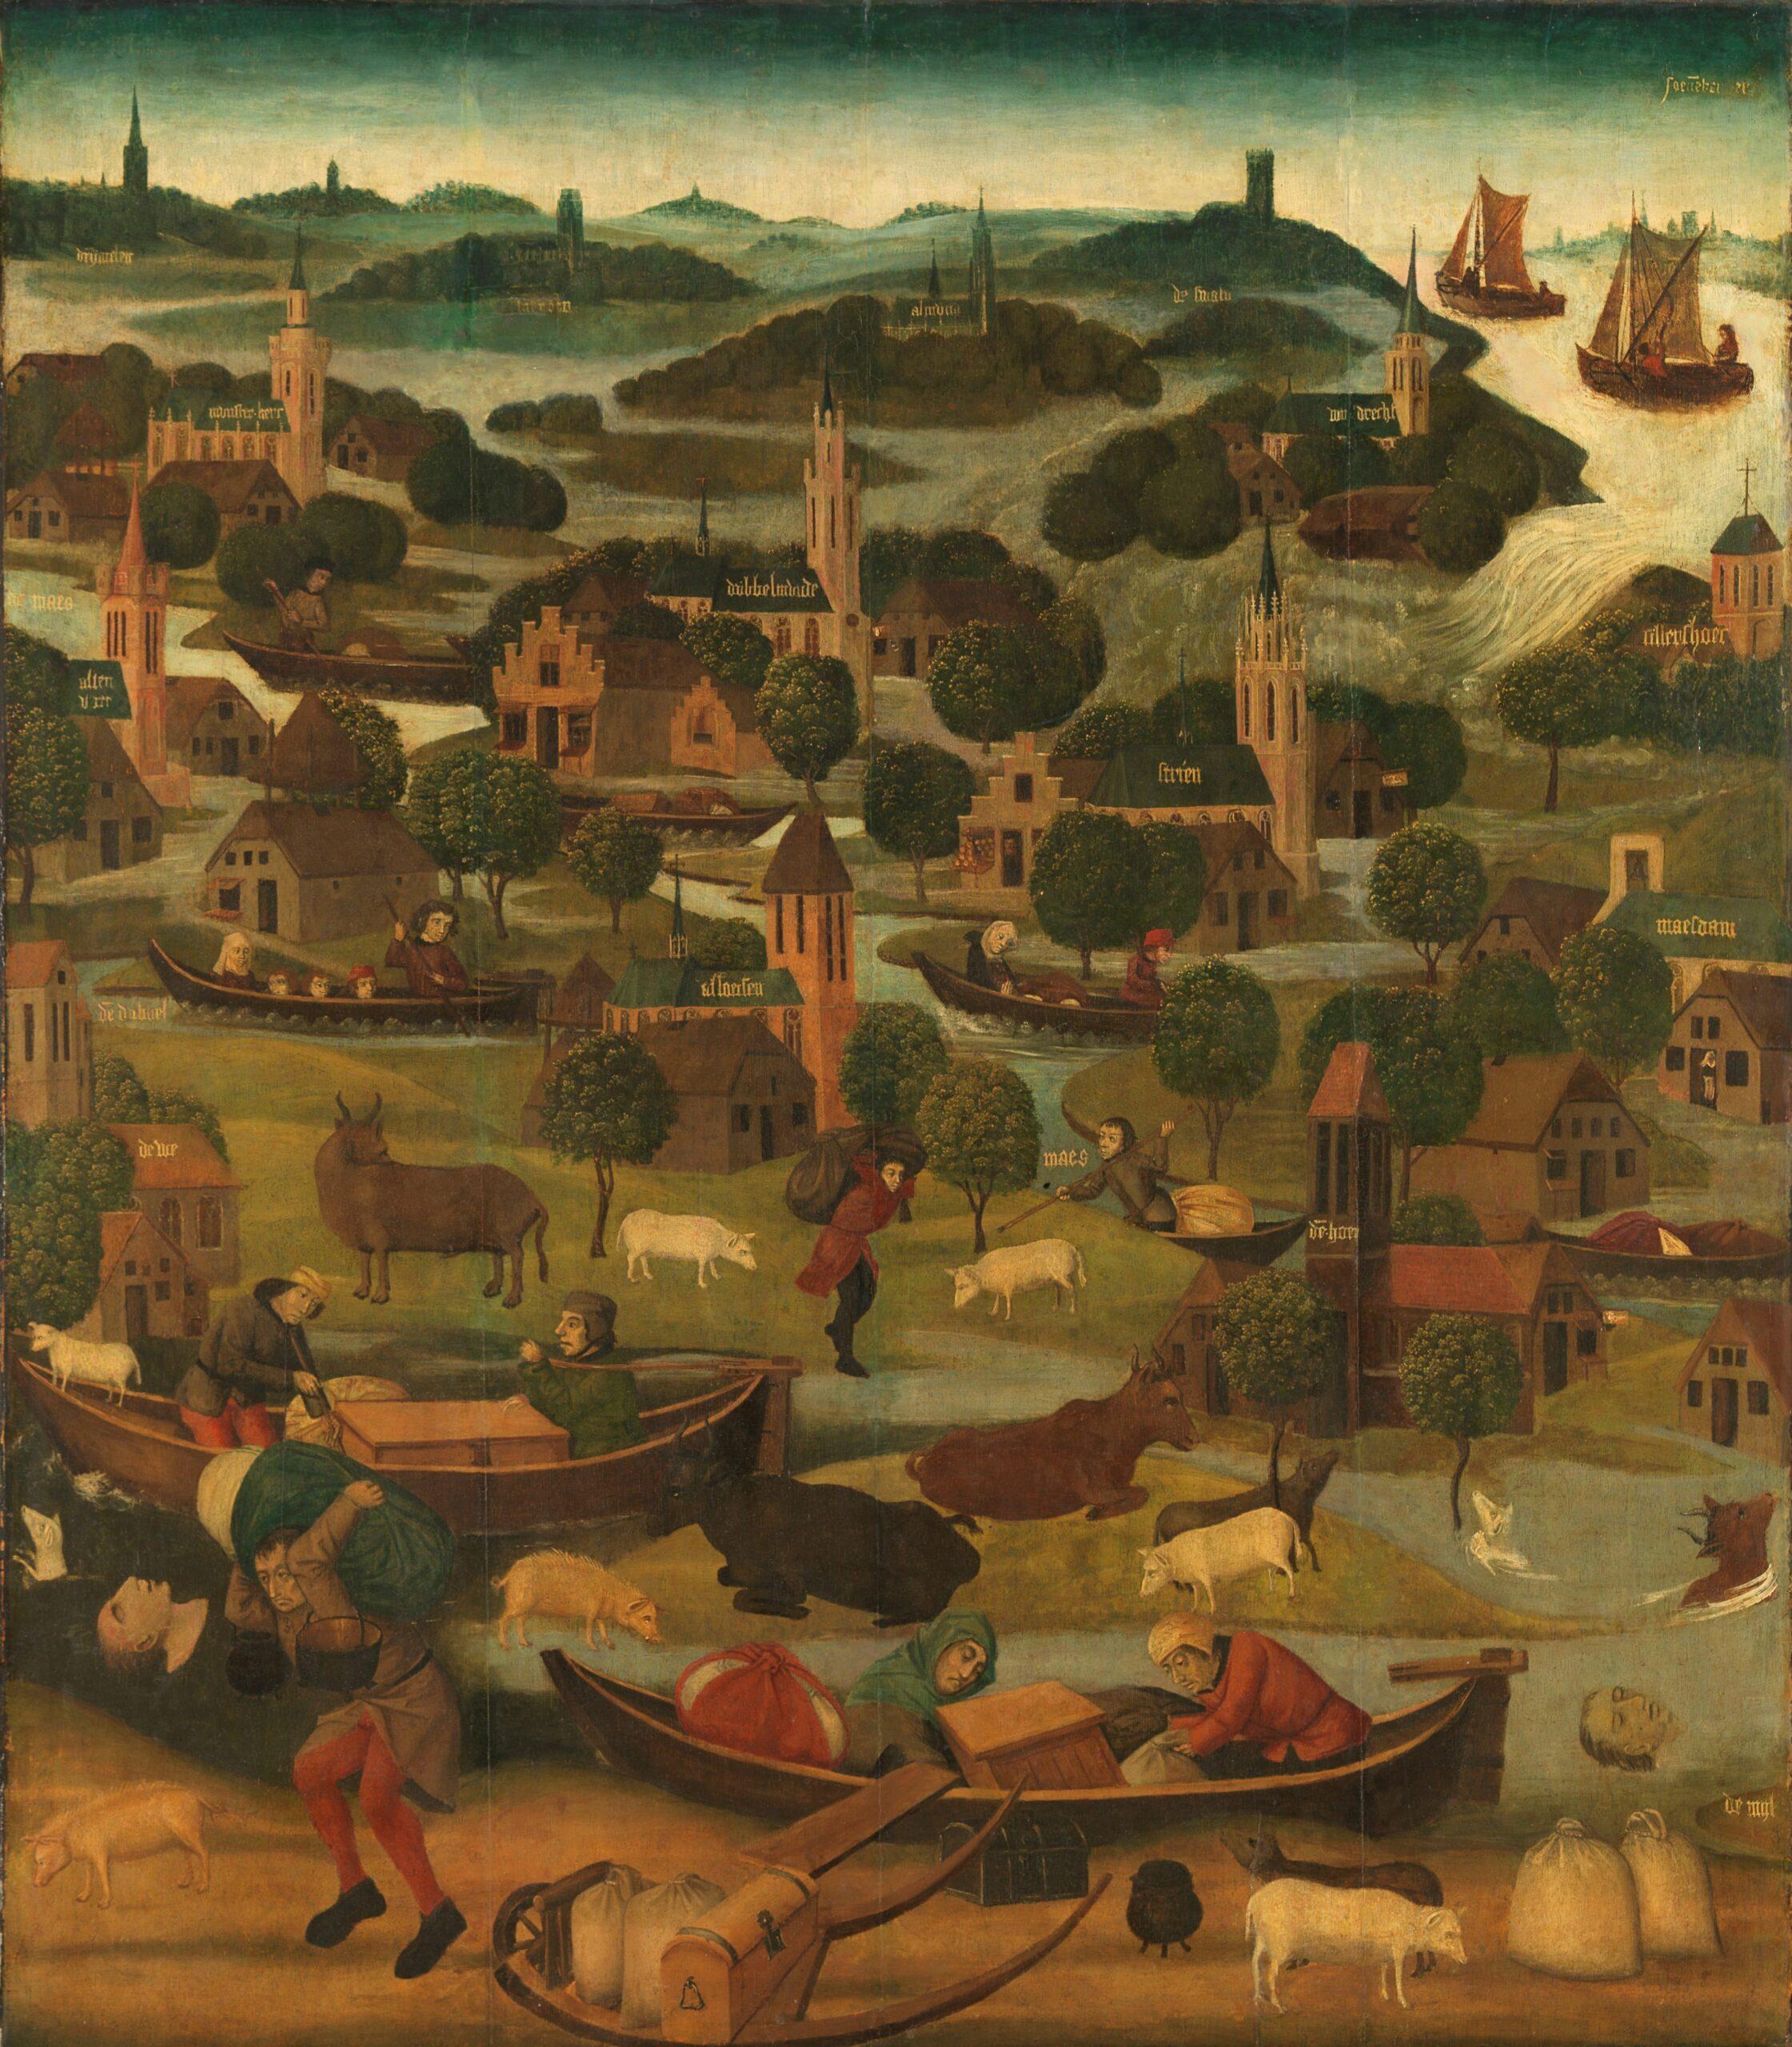 Rijksmuseum, The Saint Elizabeth's Day Flood (Panel B)